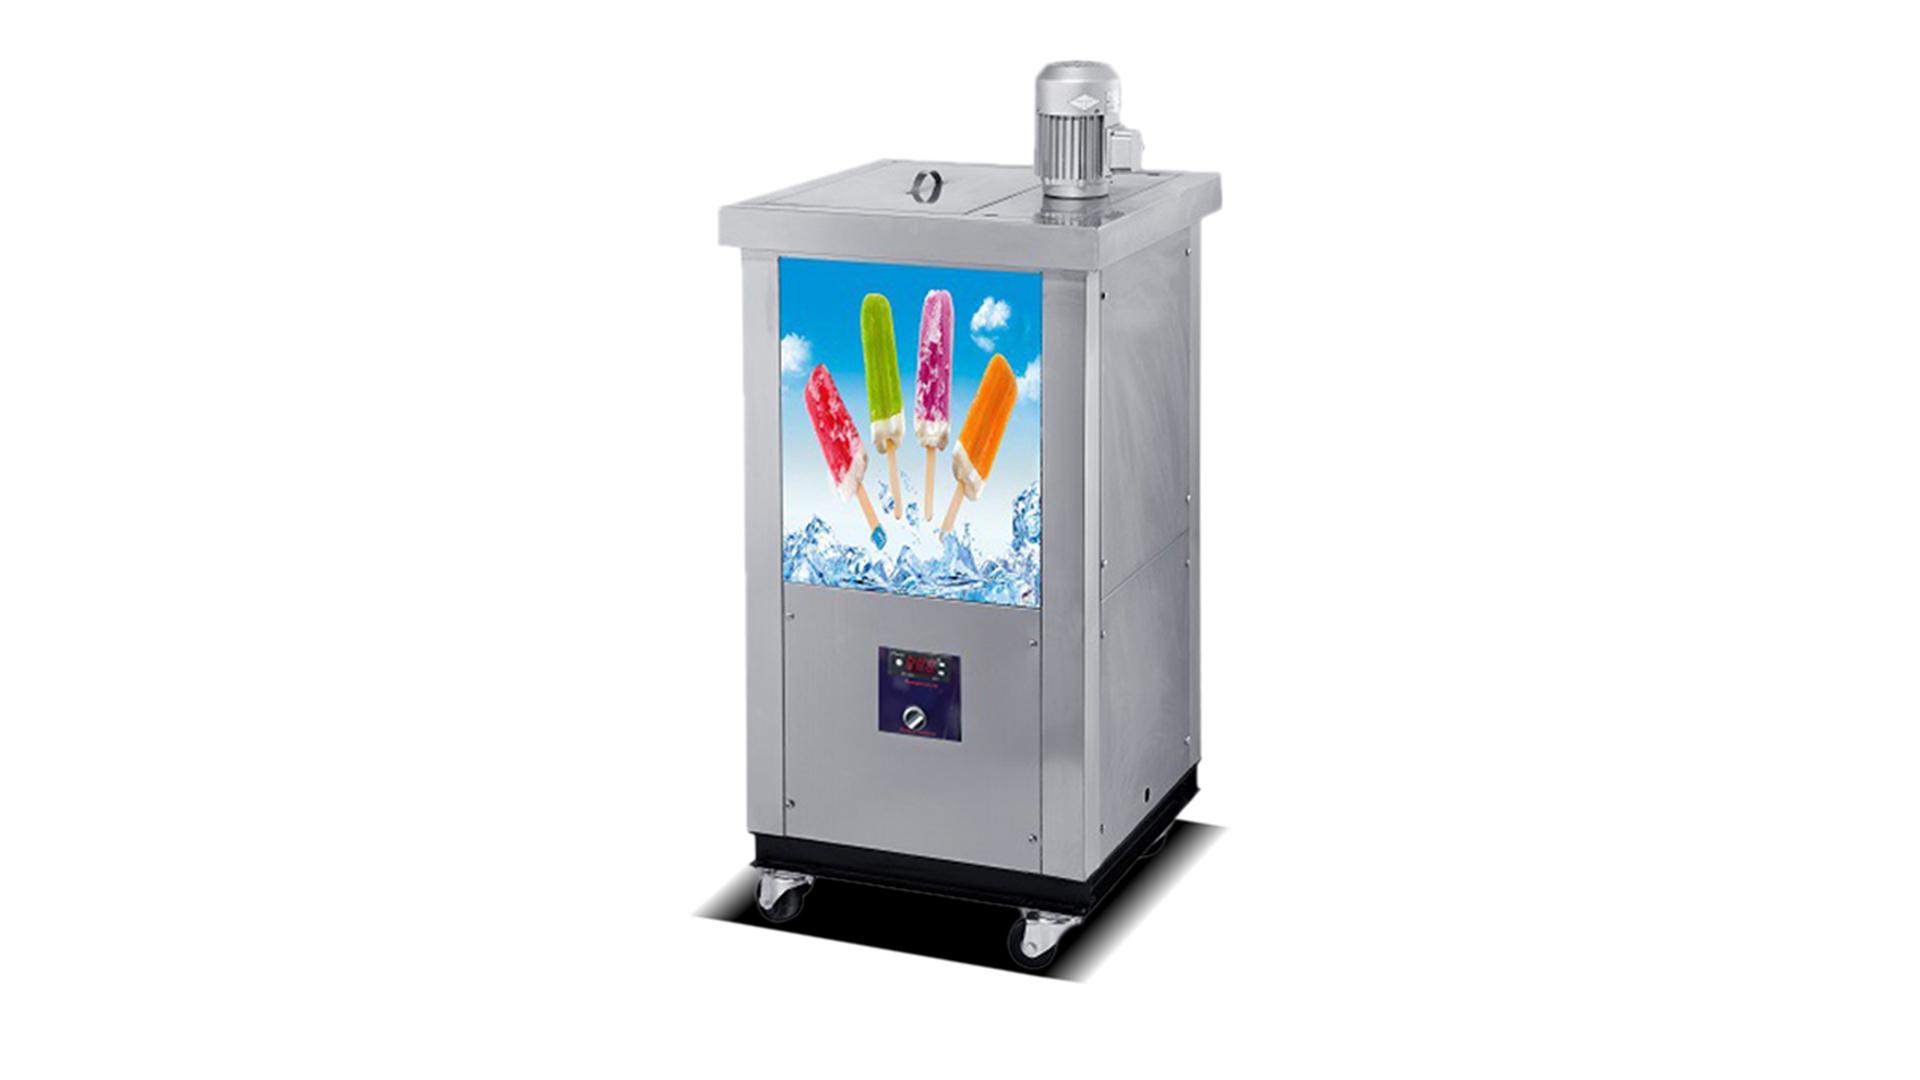 Commercial Speediness Ice Popsicle Maker Machine, Frozen Ice Sucker Machine for sale